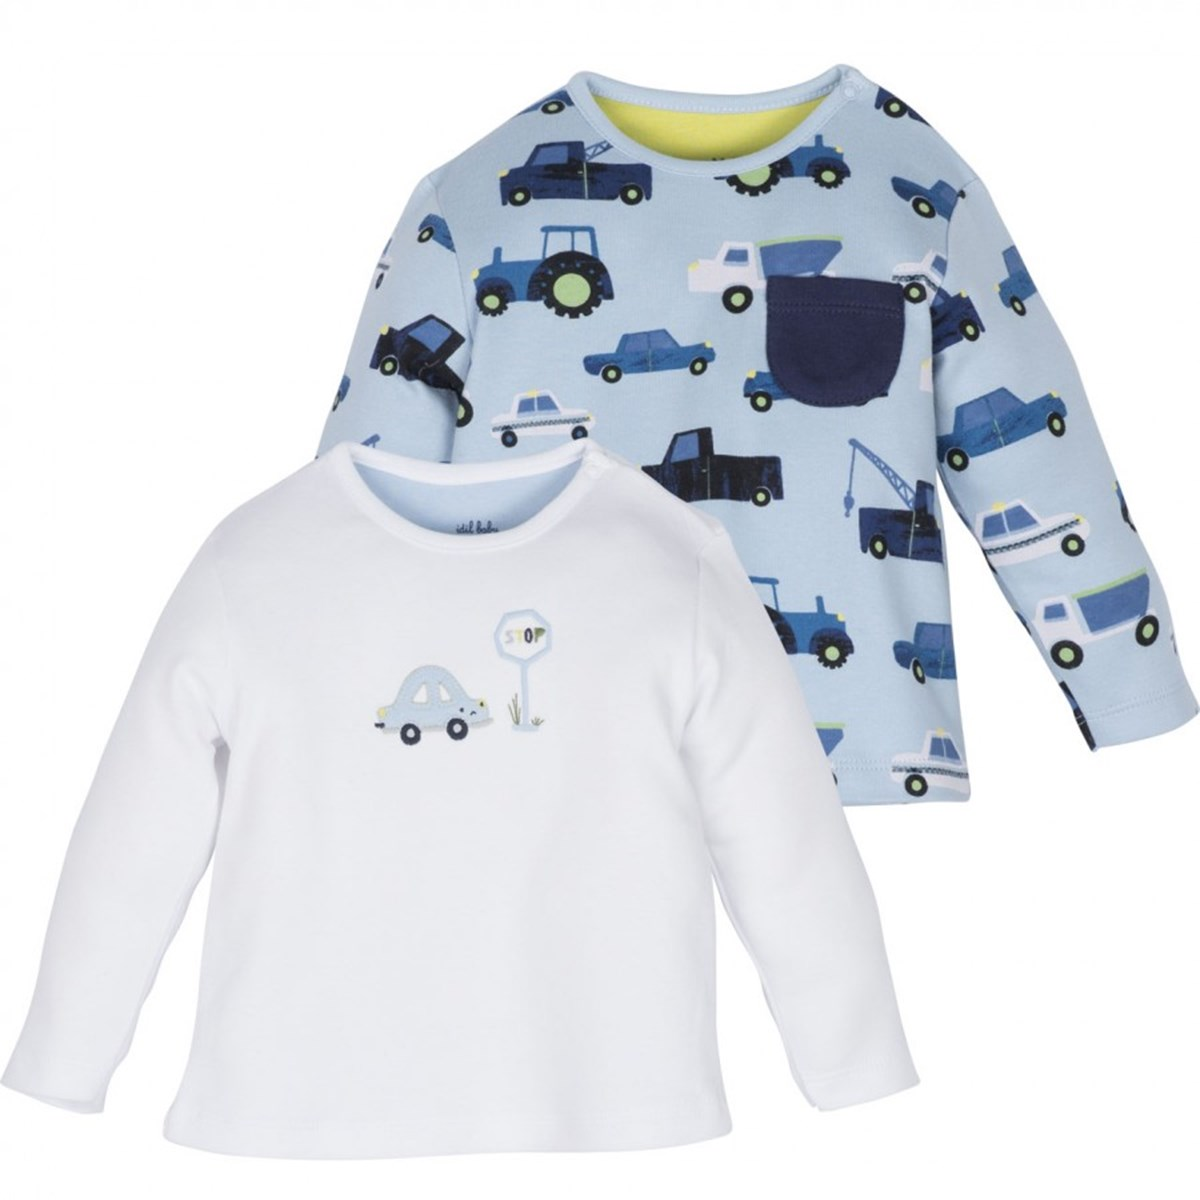 11943 2'li T-Shirt 1